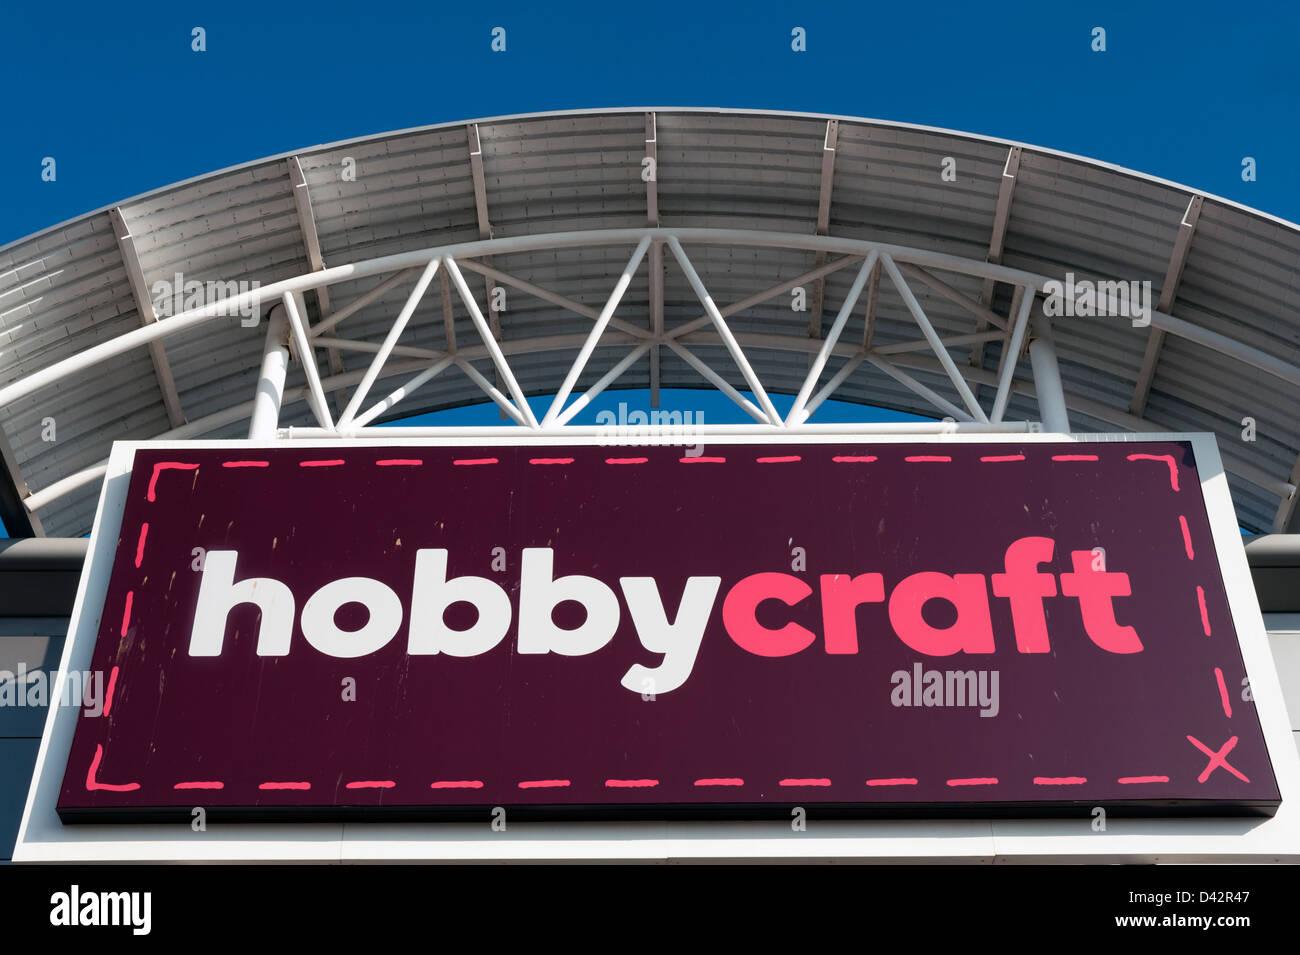 Hobby Craft shop in Hereford, Regno Unito. Immagini Stock